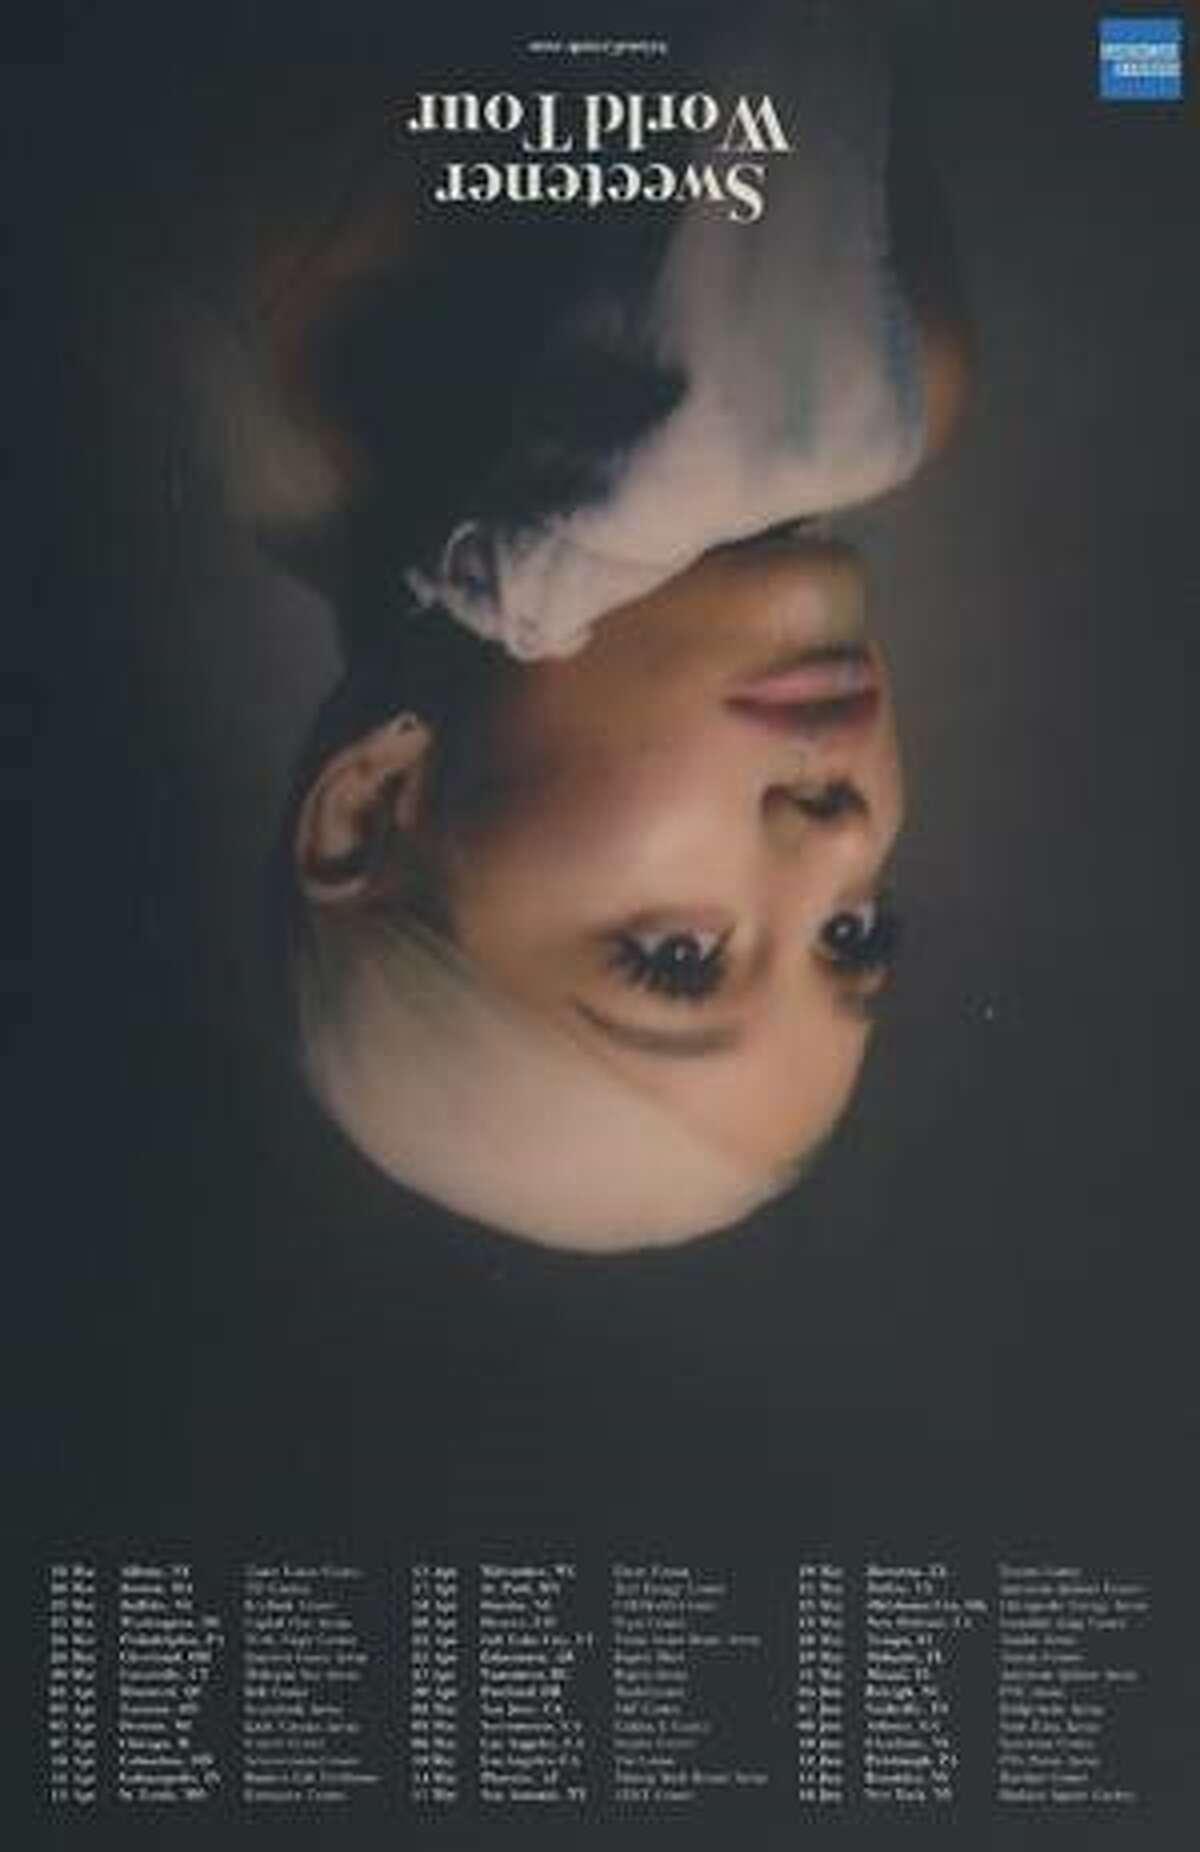 Ariana Grande is bringing The Sweetener World Tour to San Antonio on May 17.